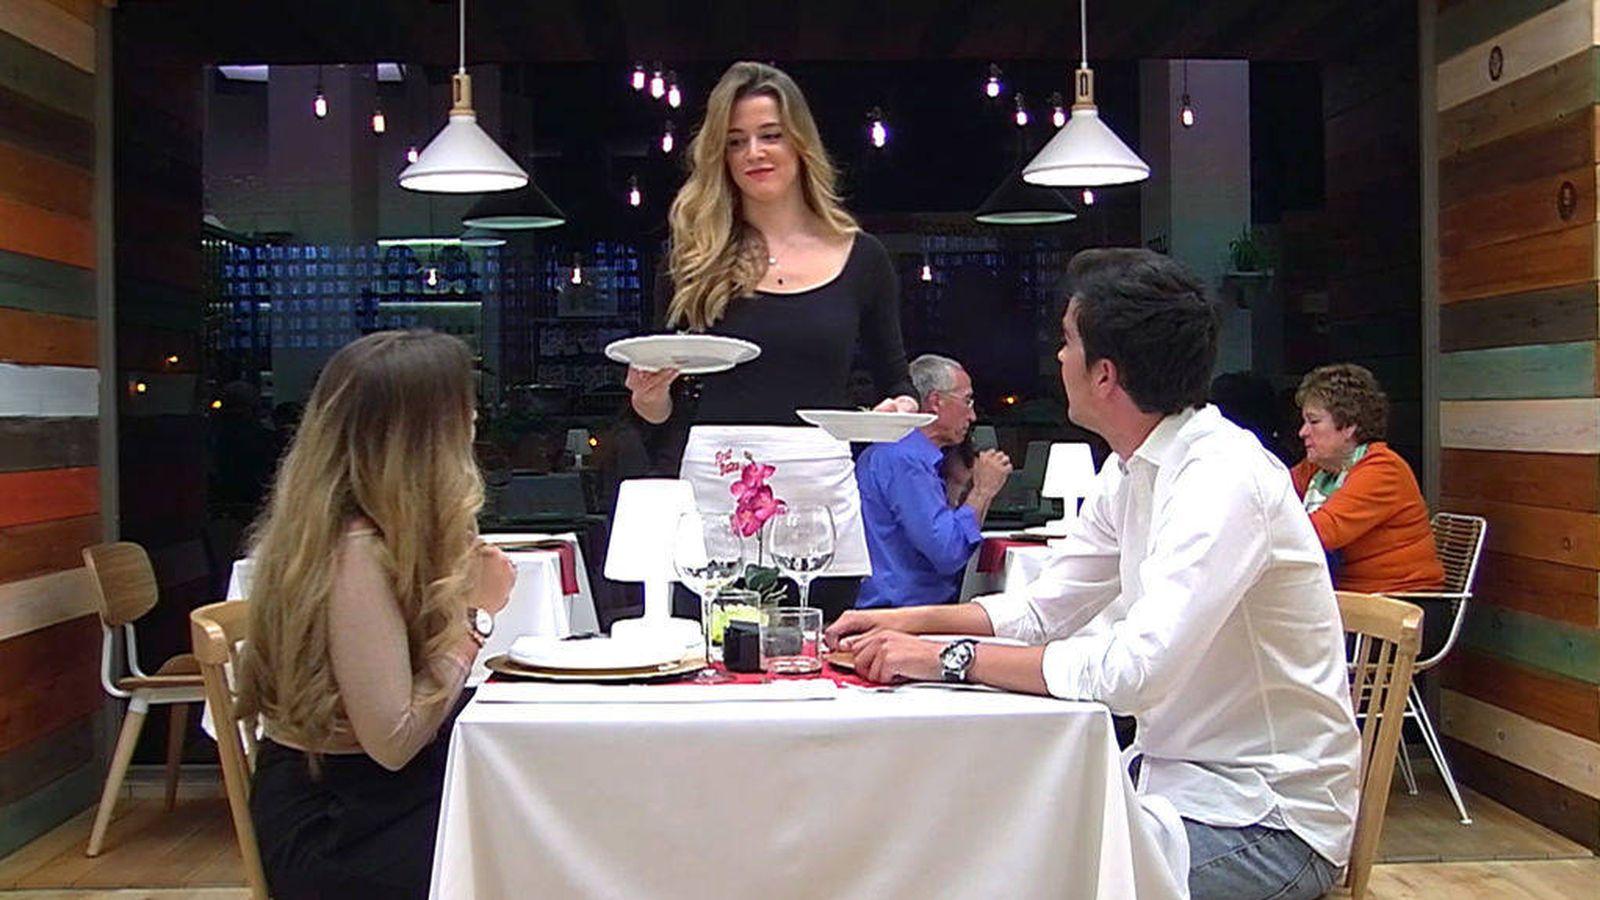 Foto: Ni Natalia ni Yulia saben dónde está Cáceres en 'First dates'.